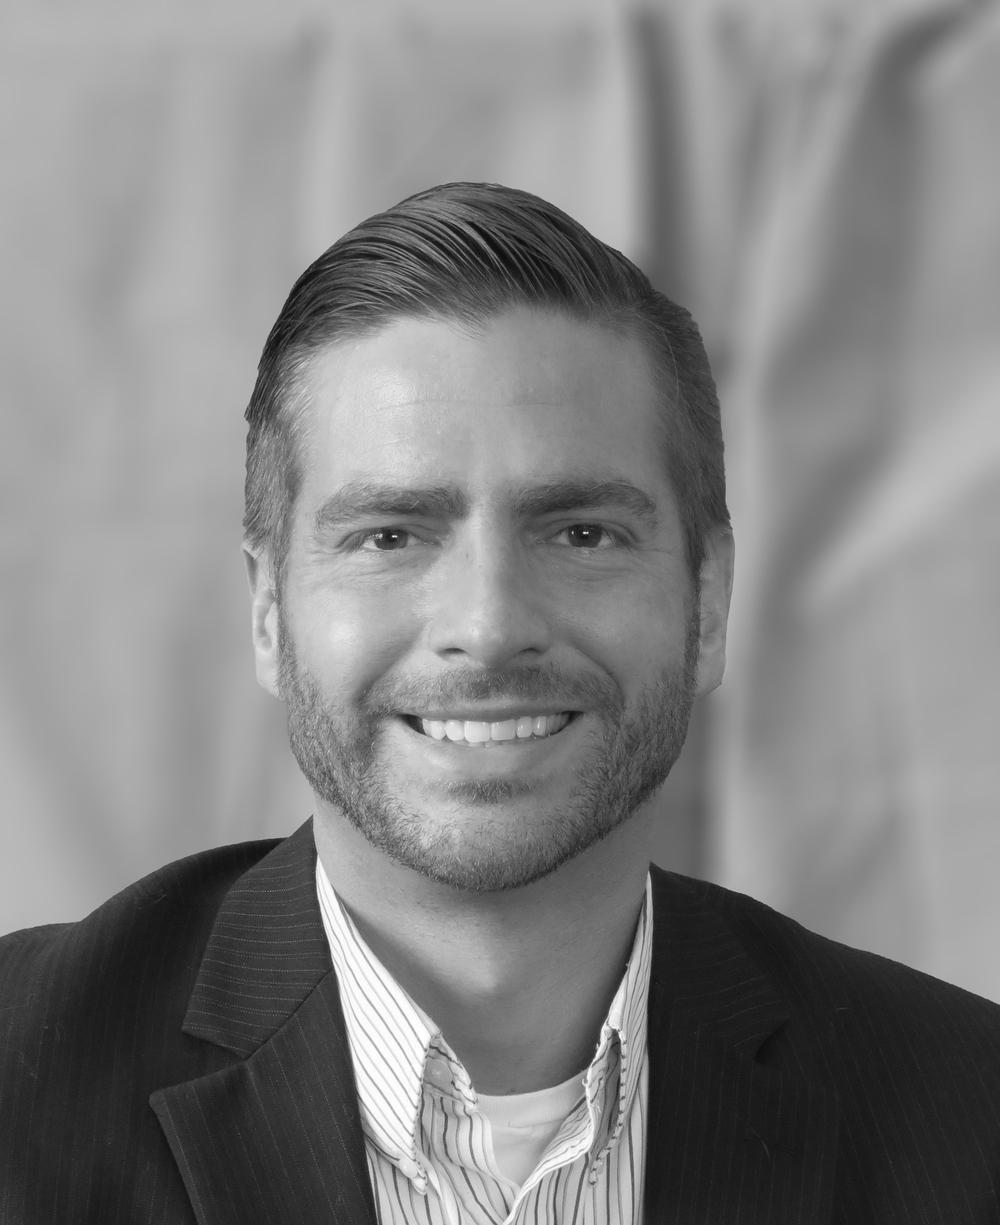 Adam Lapekes - Marketing Coordinator